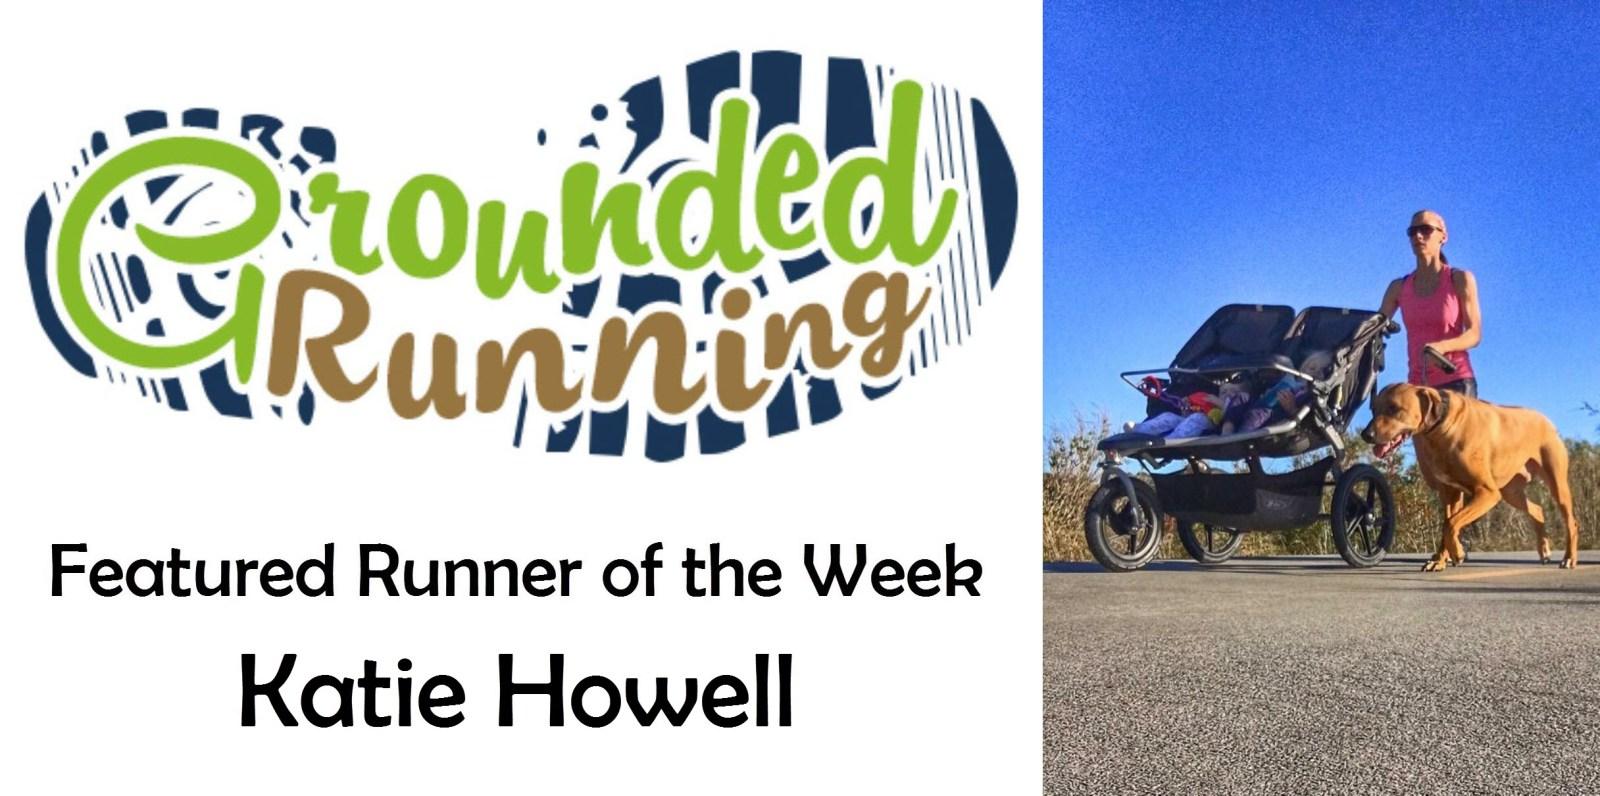 Katie Howell - Featured Runner of the Week